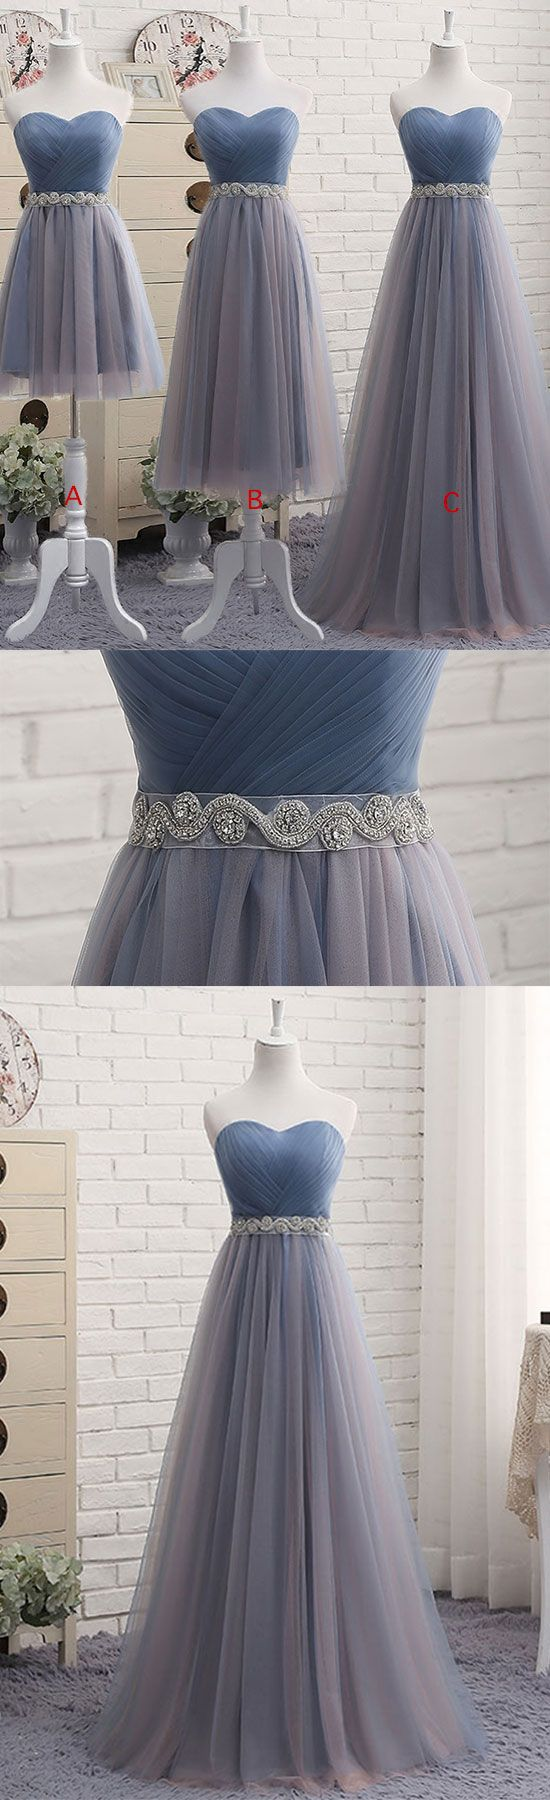 best formal images on pinterest cute dresses ballroom dress